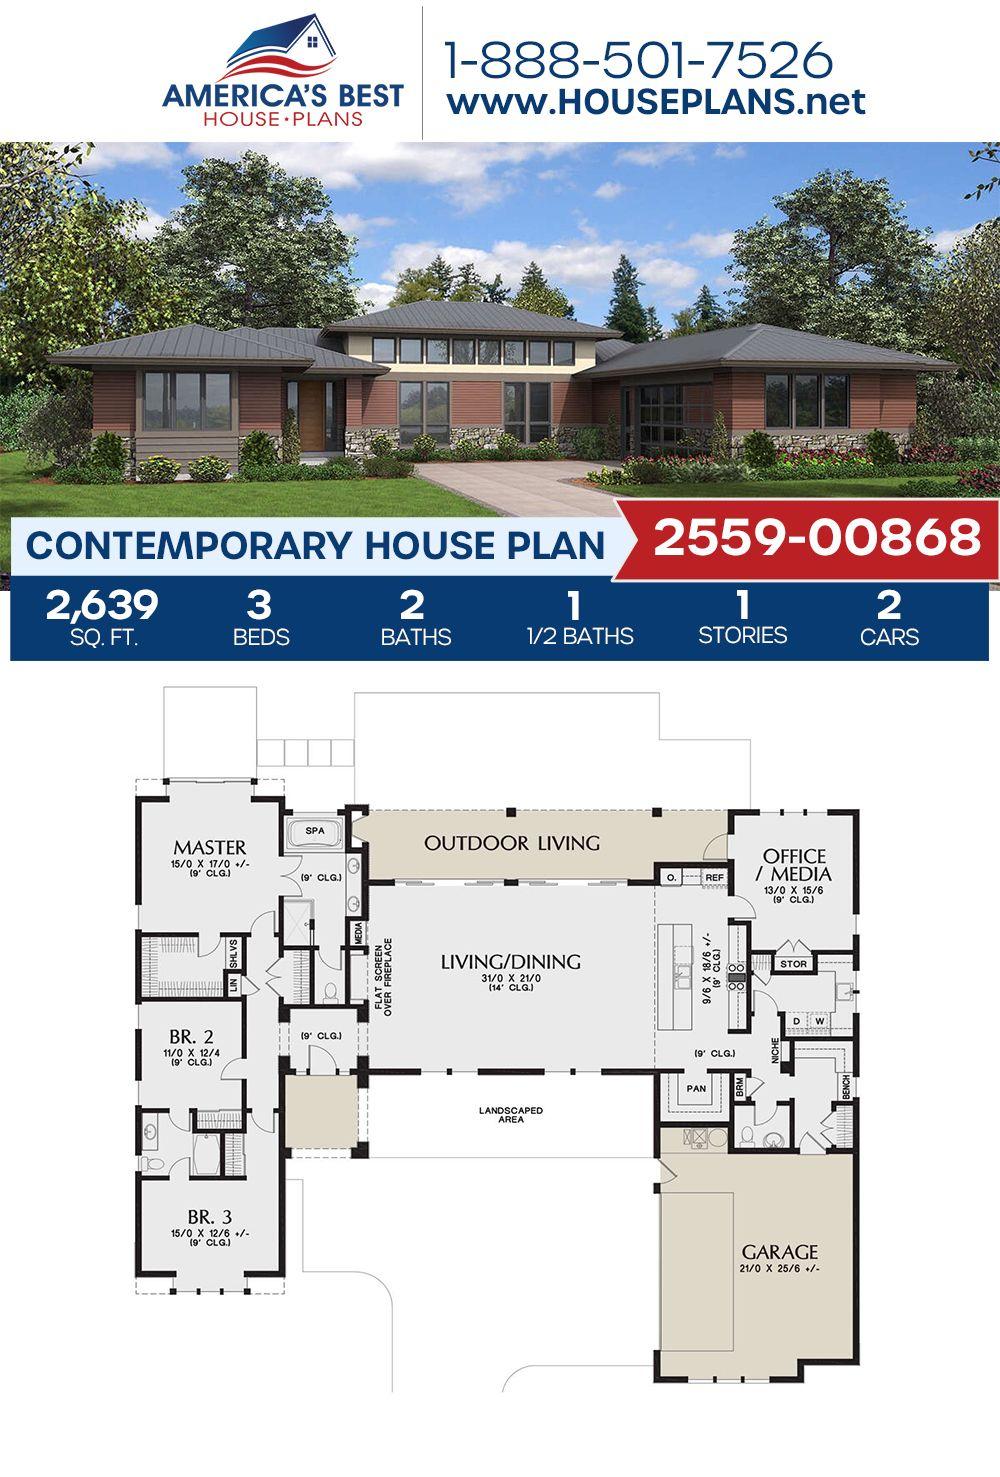 House Plan 2559 00868 Contemporary Plan 2 639 Square Feet 3 Bedrooms 2 5 Bathrooms In 2020 Contemporary House Plans House Plans Dream House Plans